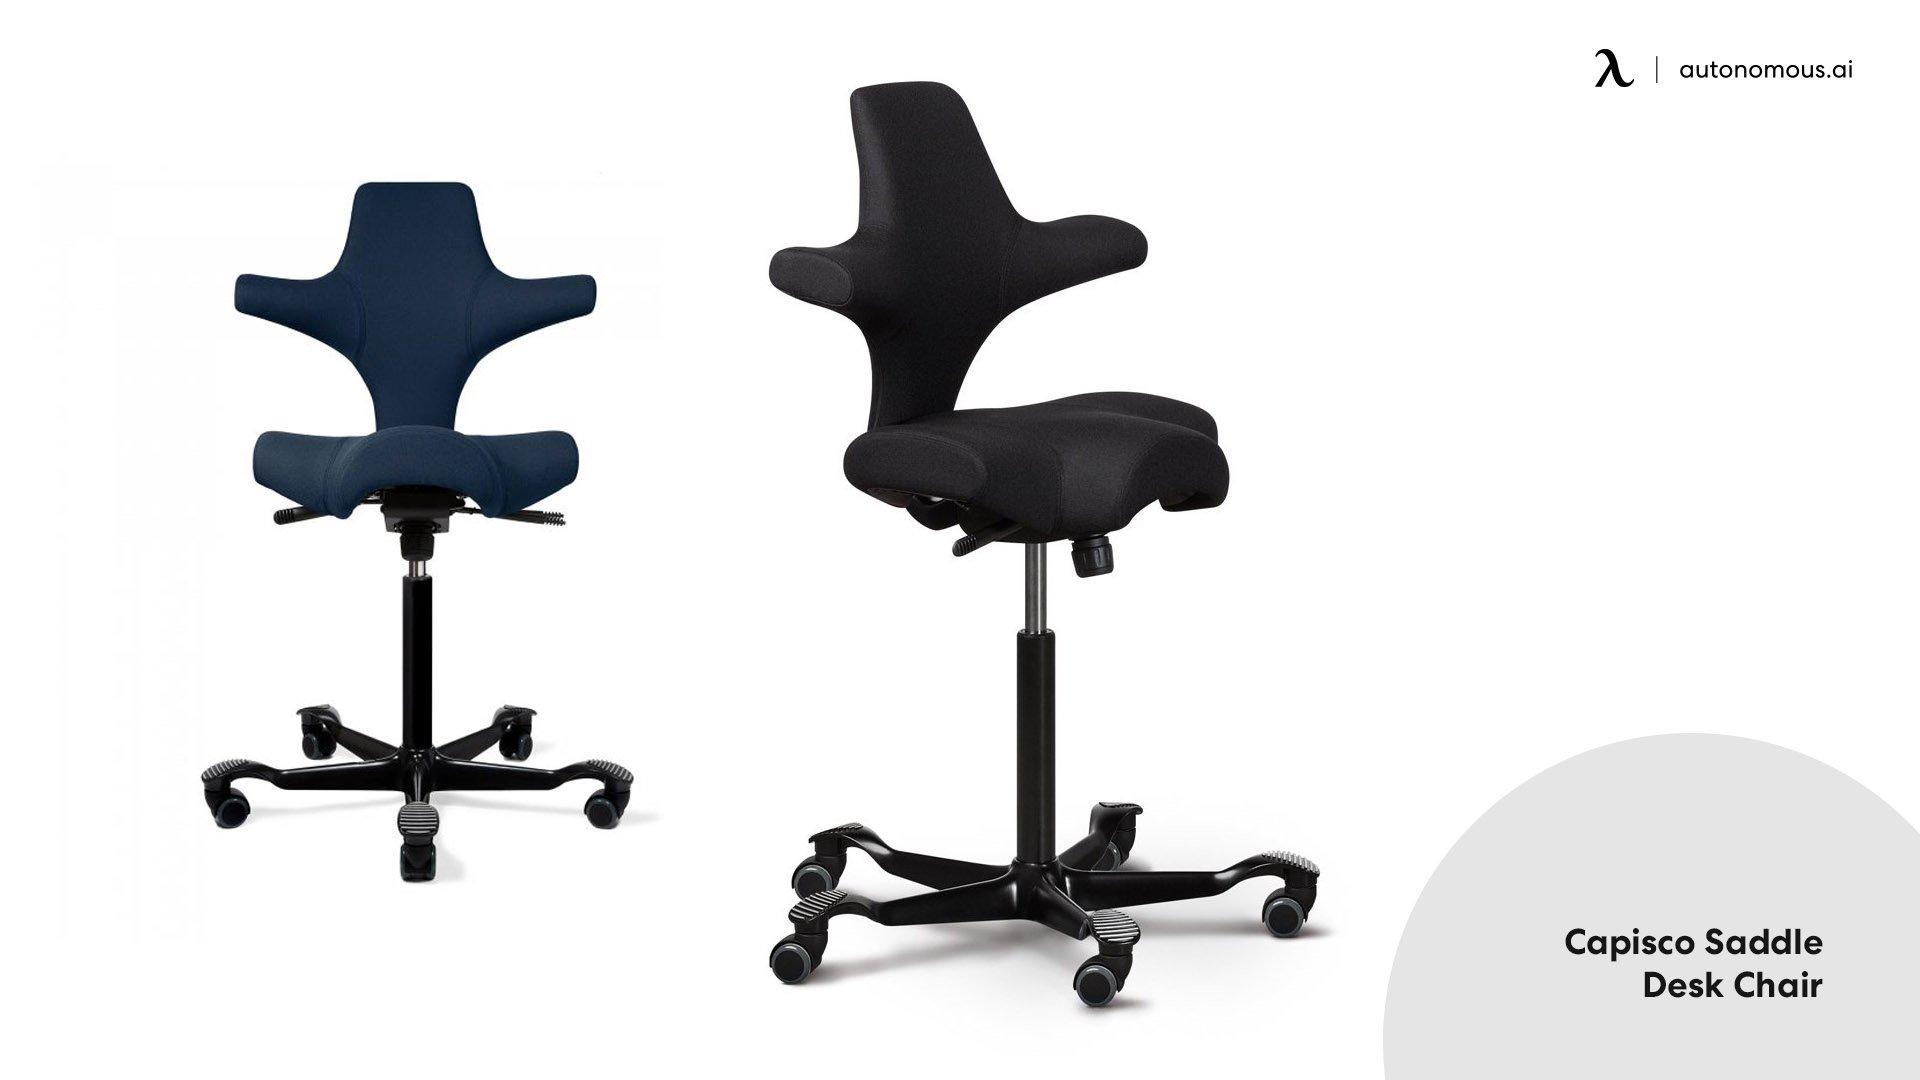 Capisco Saddle Desk Chair